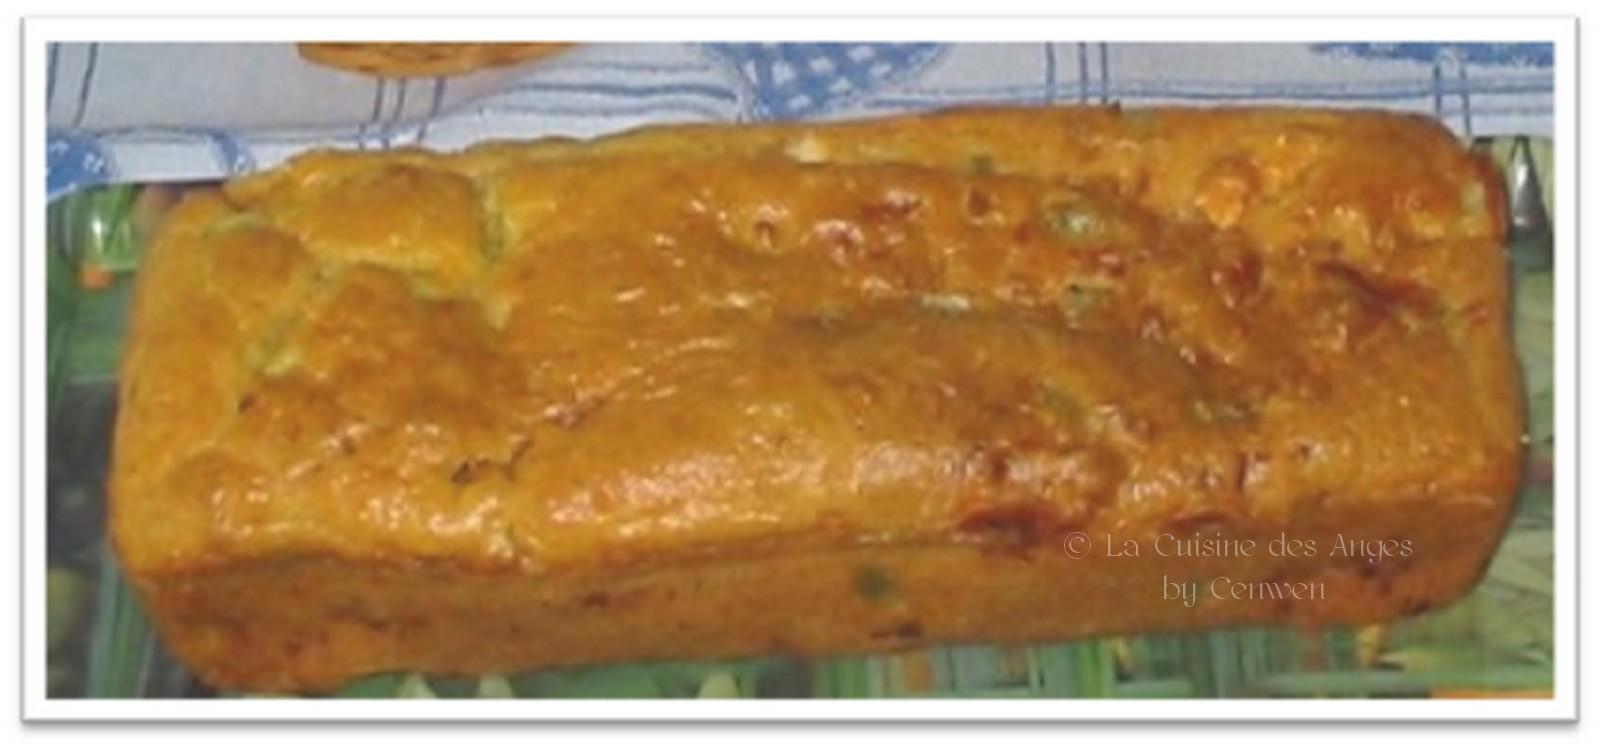 Cake Courgette Chevre Duree Cuisson